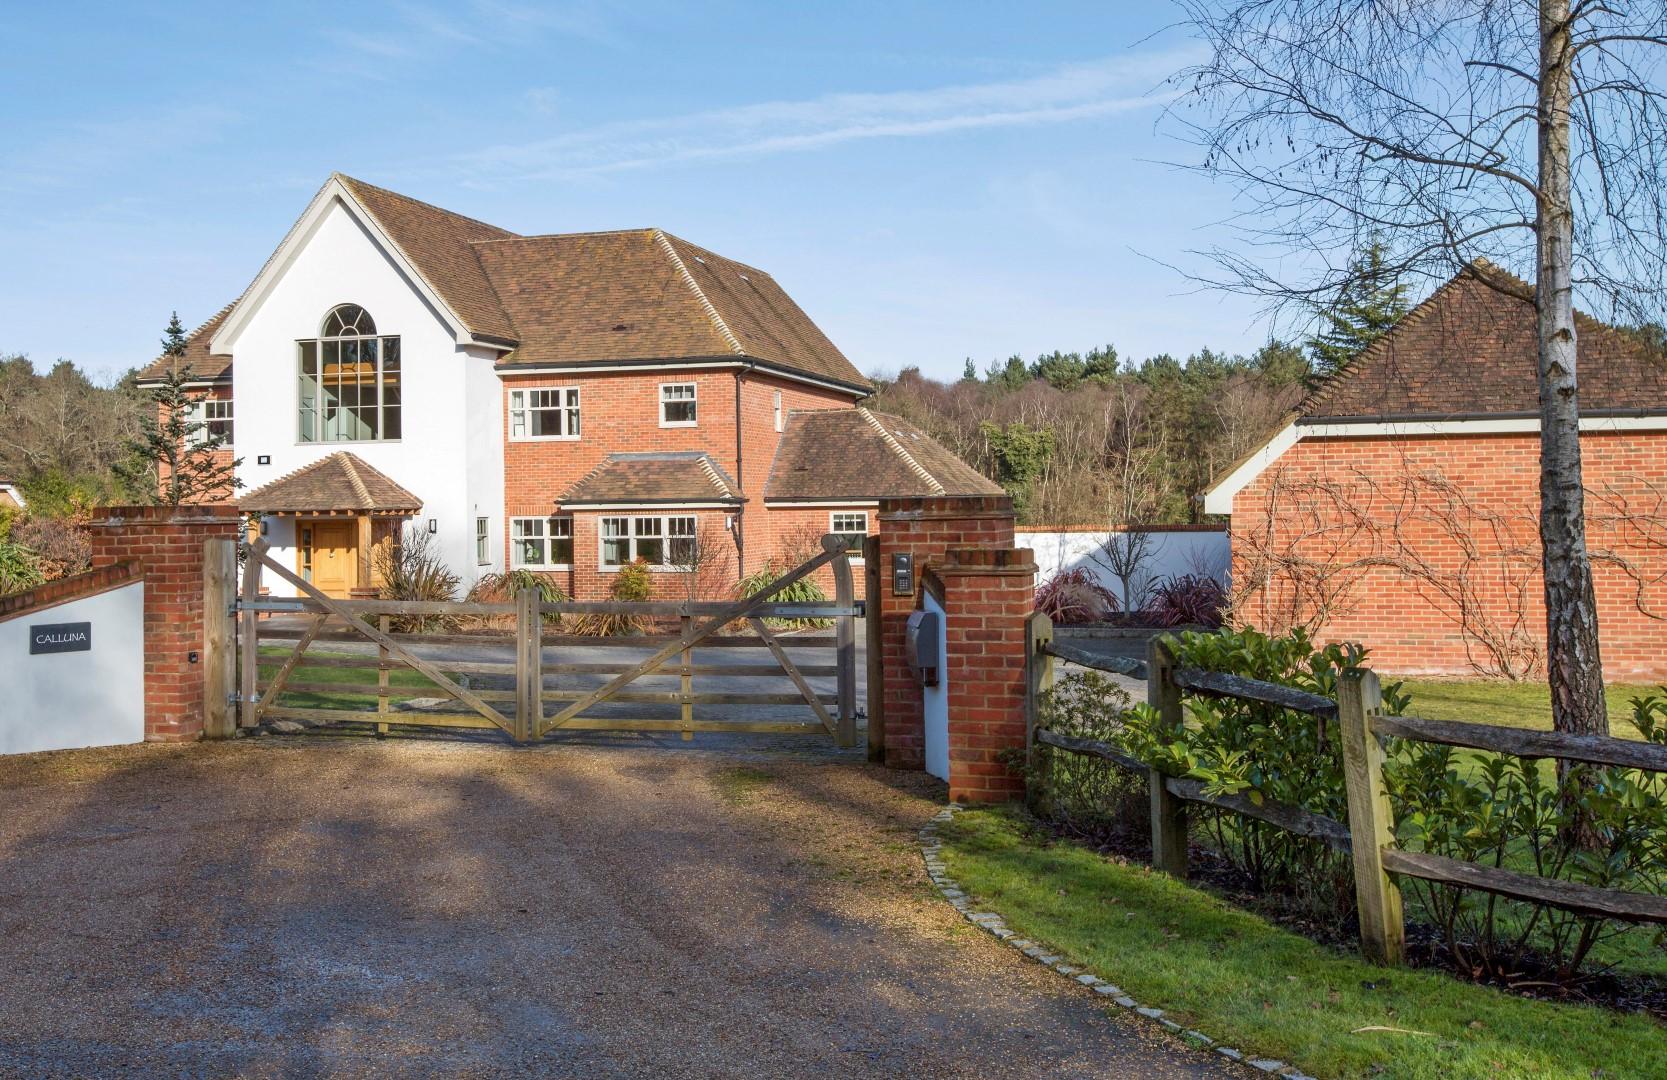 Single Family Home for Sale at Worplesdon Blackhorse Road Other England, England GU220QT United Kingdom